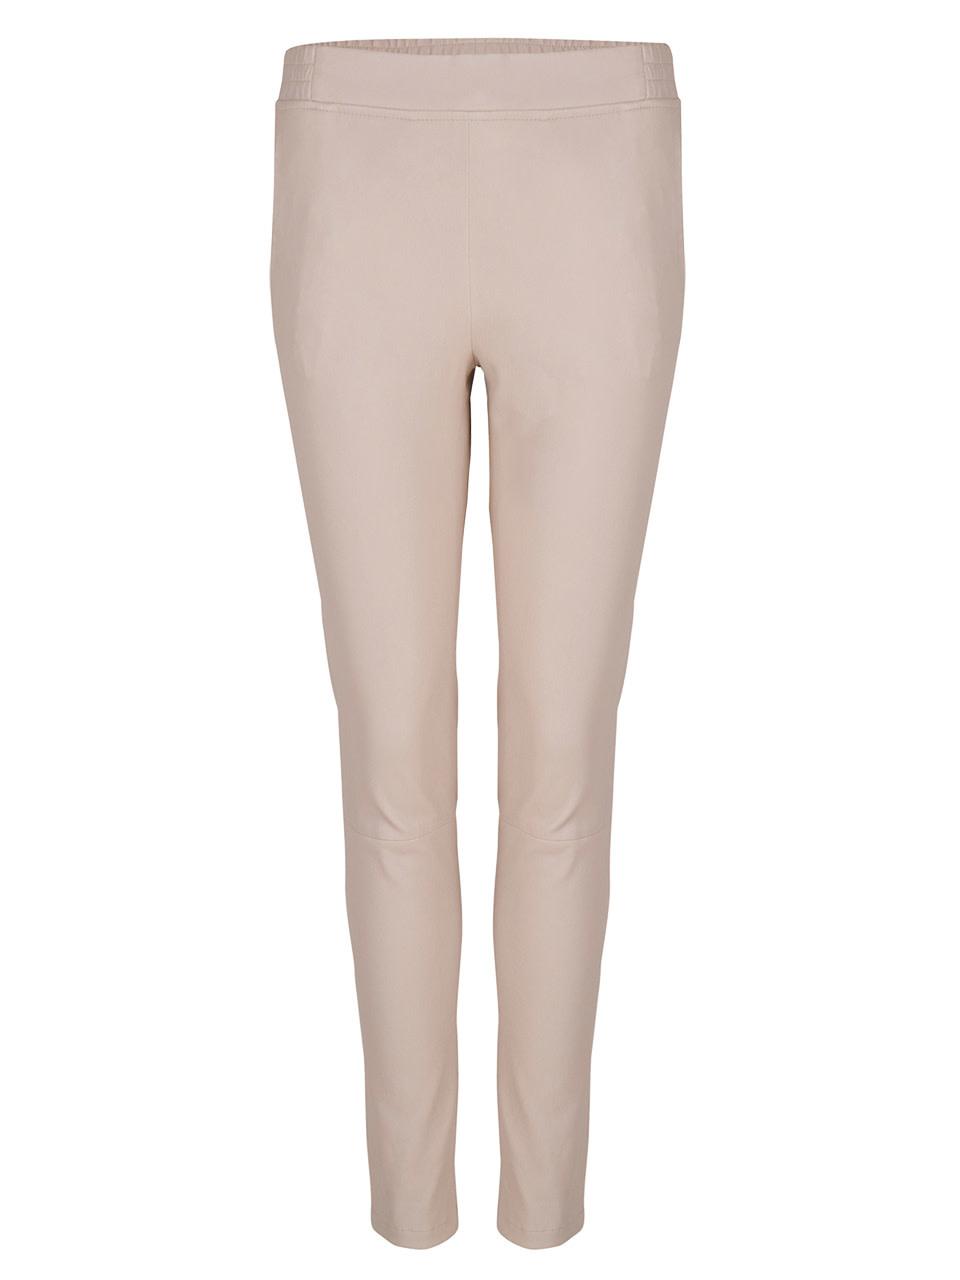 Lebon leather stretch pants Sand-1